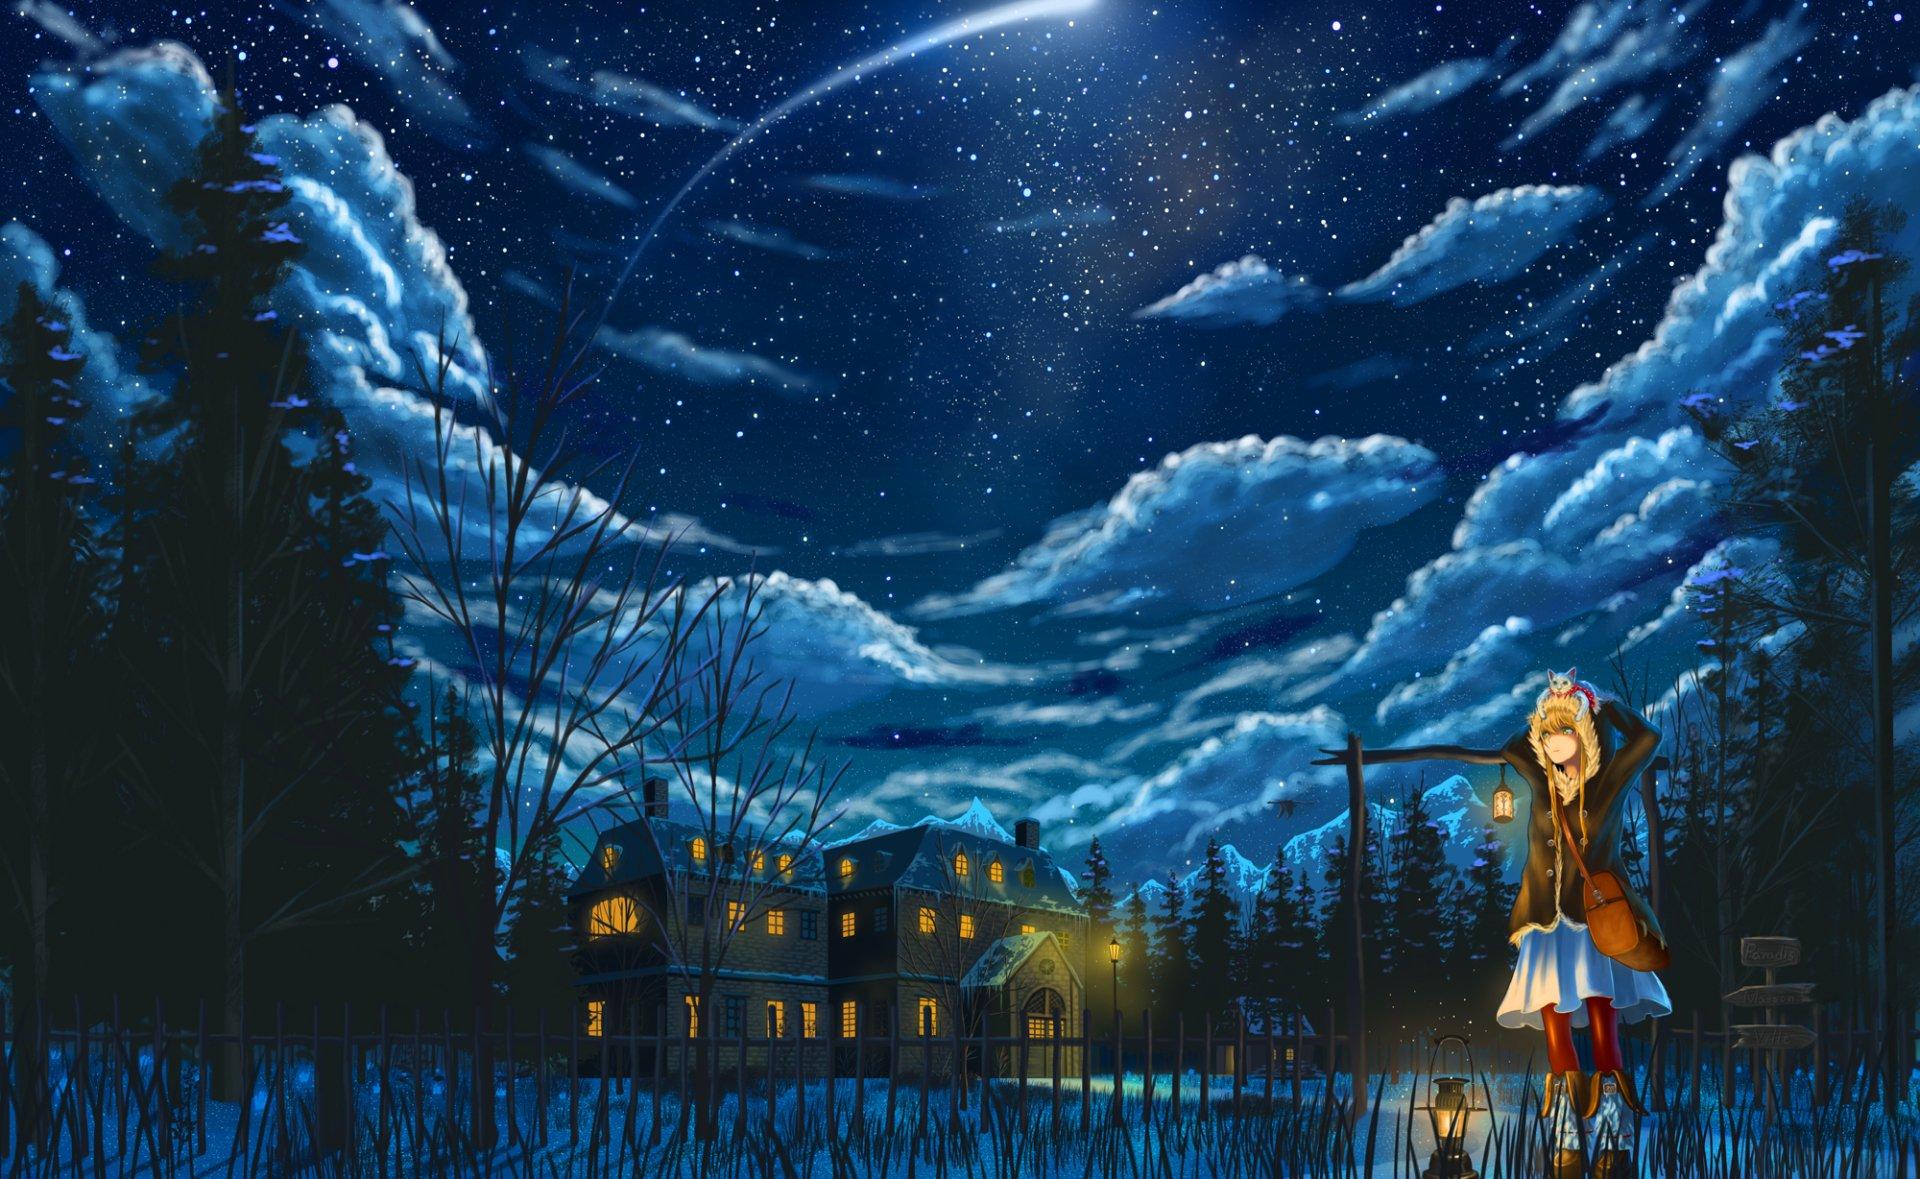 Pixiv Fantasia: New World HD Wallpaper | Background Image